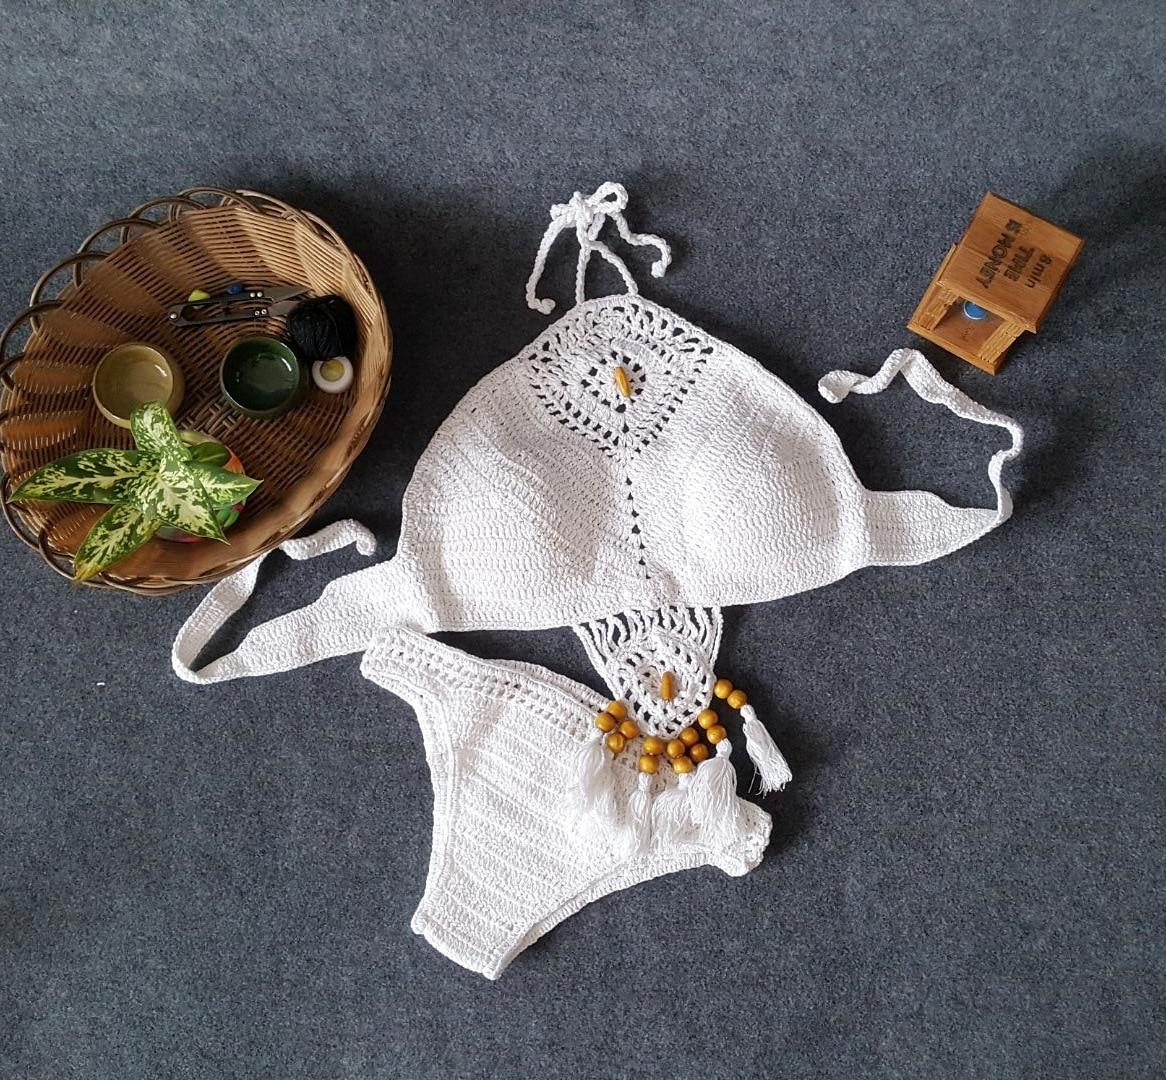 2018 Knitting Swimsuit Crochet Bikini Set Bohemia Style High Neck Bathing Suit Beachwear Low Waist Handmade Pads String Seawear fashion tortoise style handmade crochet knitting beanie hat clothes set for baby